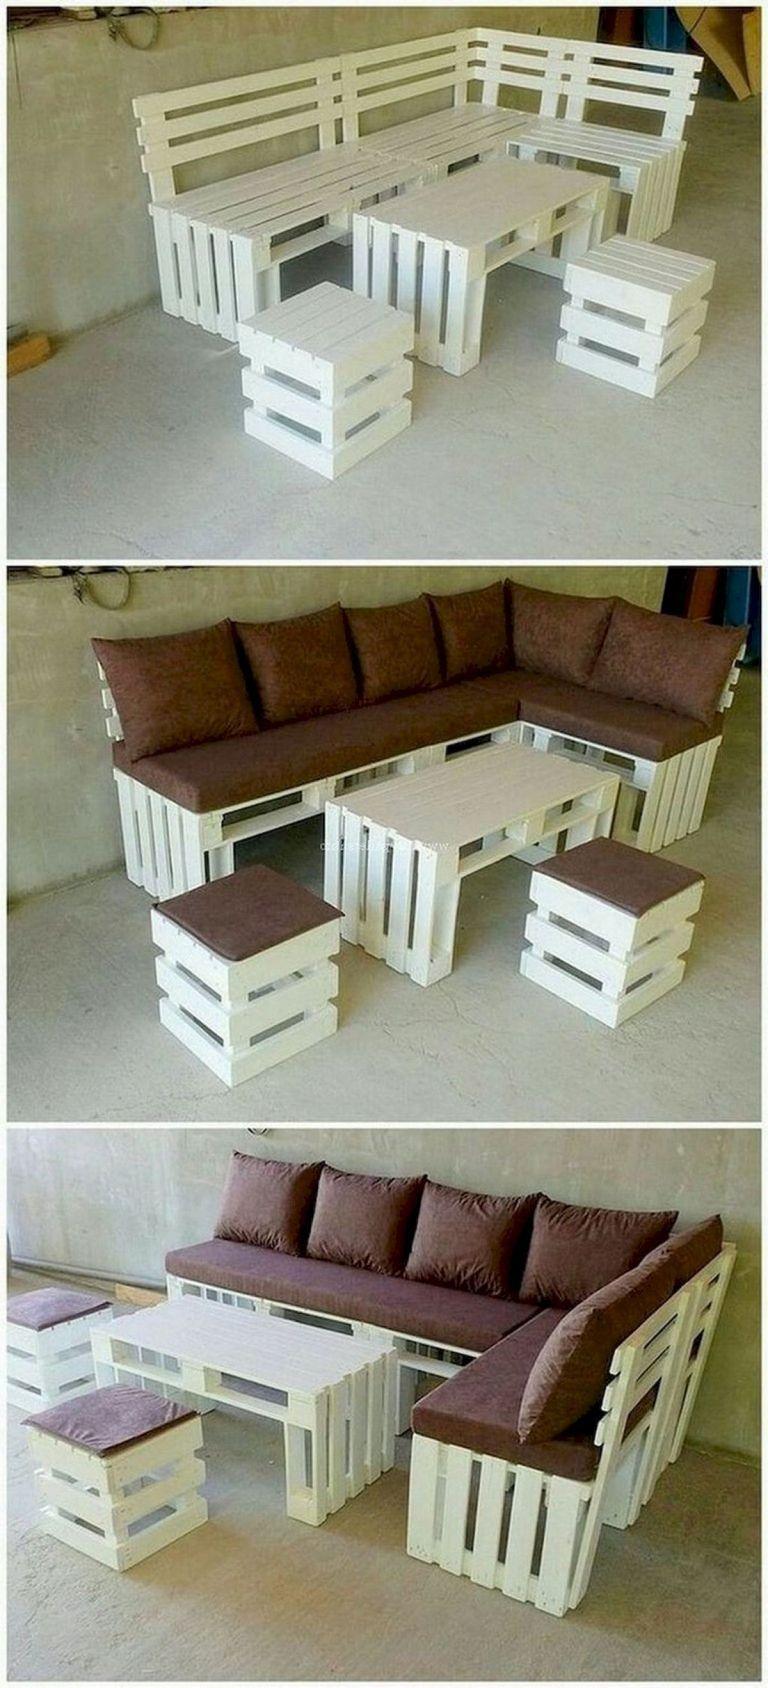 30 Creative Diy Wooden Pallet Projects Ideas 12 Mobilier D